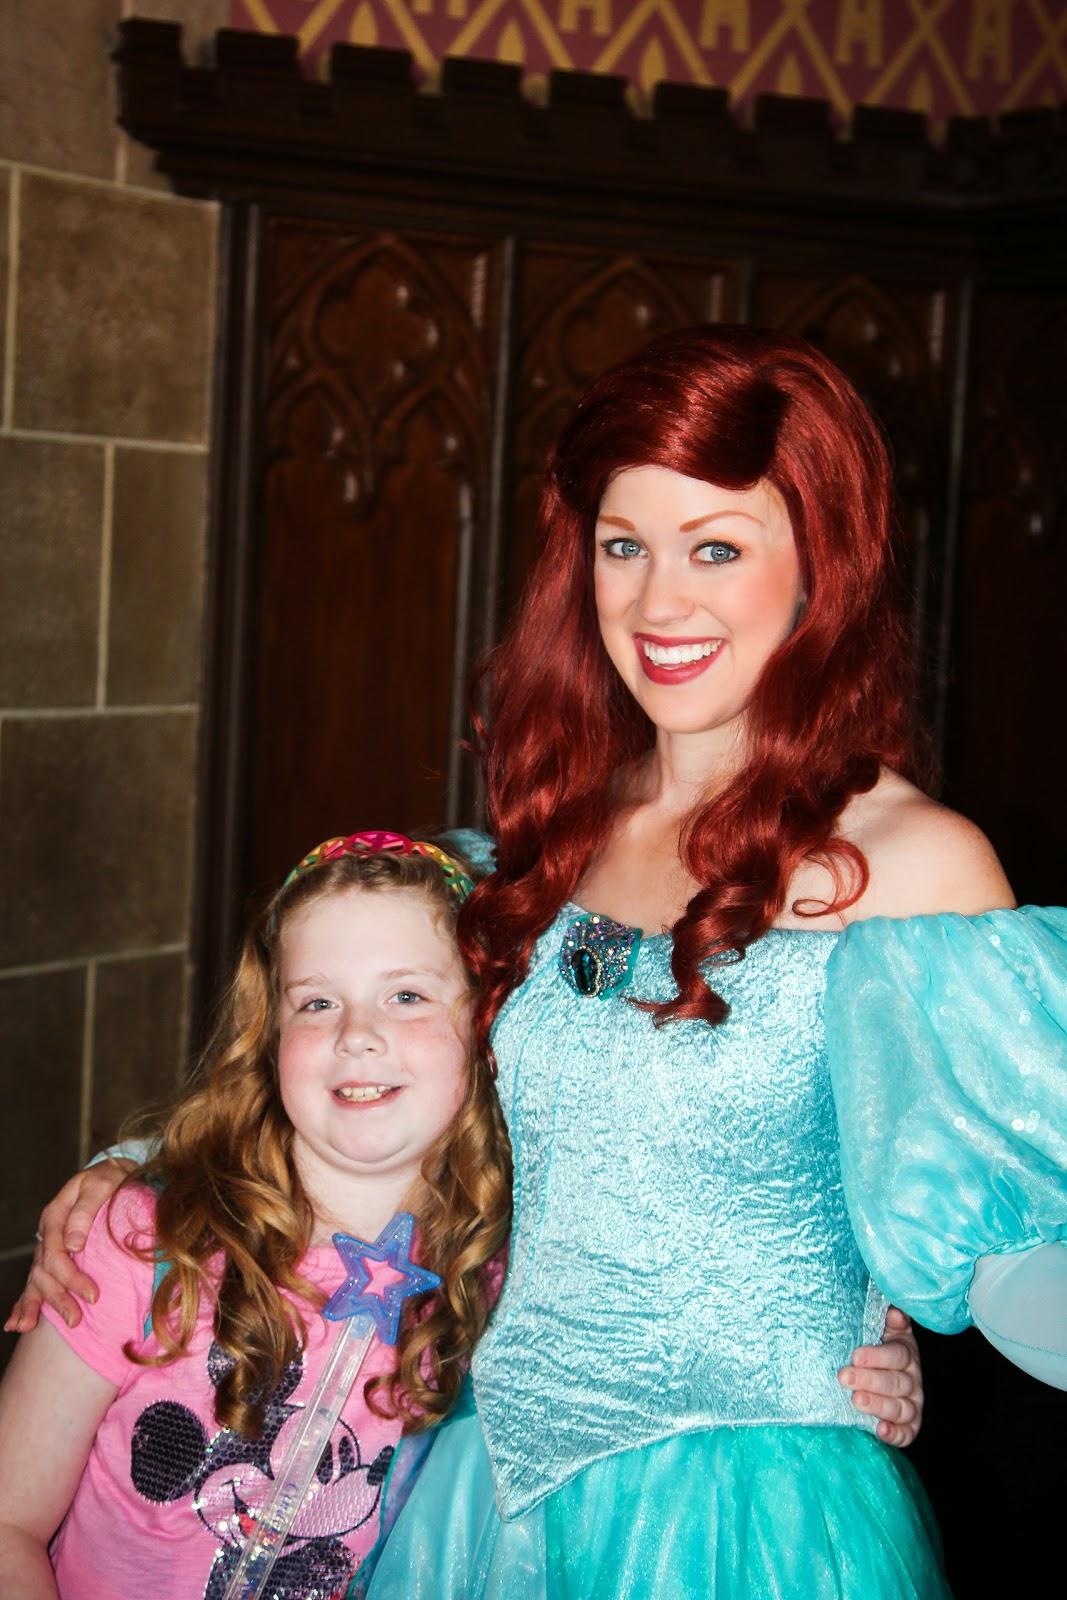 Princess Ariel, the Little Mermaid